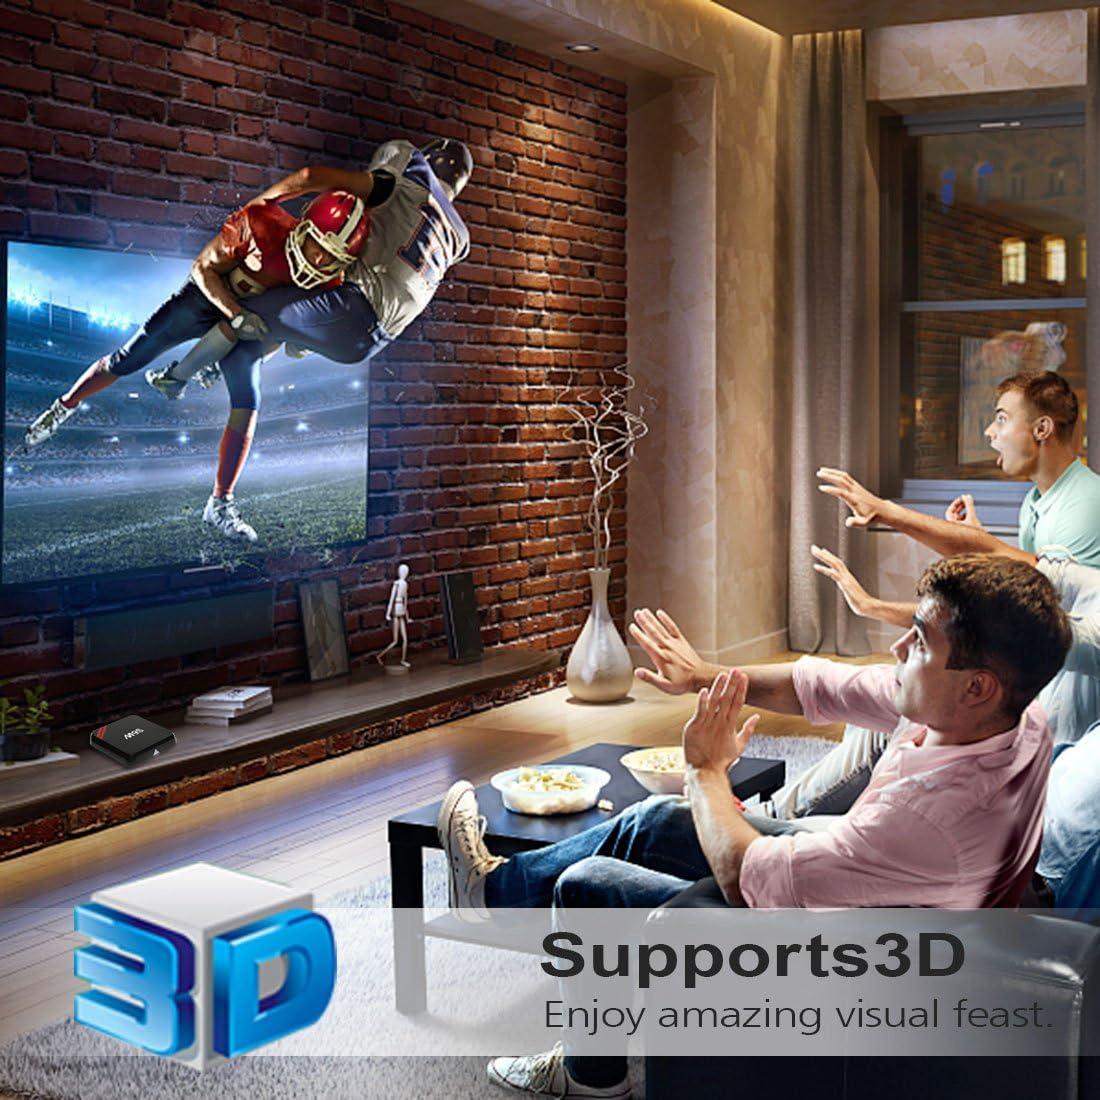 Leelbox M9S Android TV Box, 2GB RAM+16GB ROM Smart TV Box/Dual-WIFI de 2.4GHz y 5.8GHz/BT 4.0/1000M LAN/H.265/4K(60 HZ)/3D/HD: Amazon.es: Electrónica